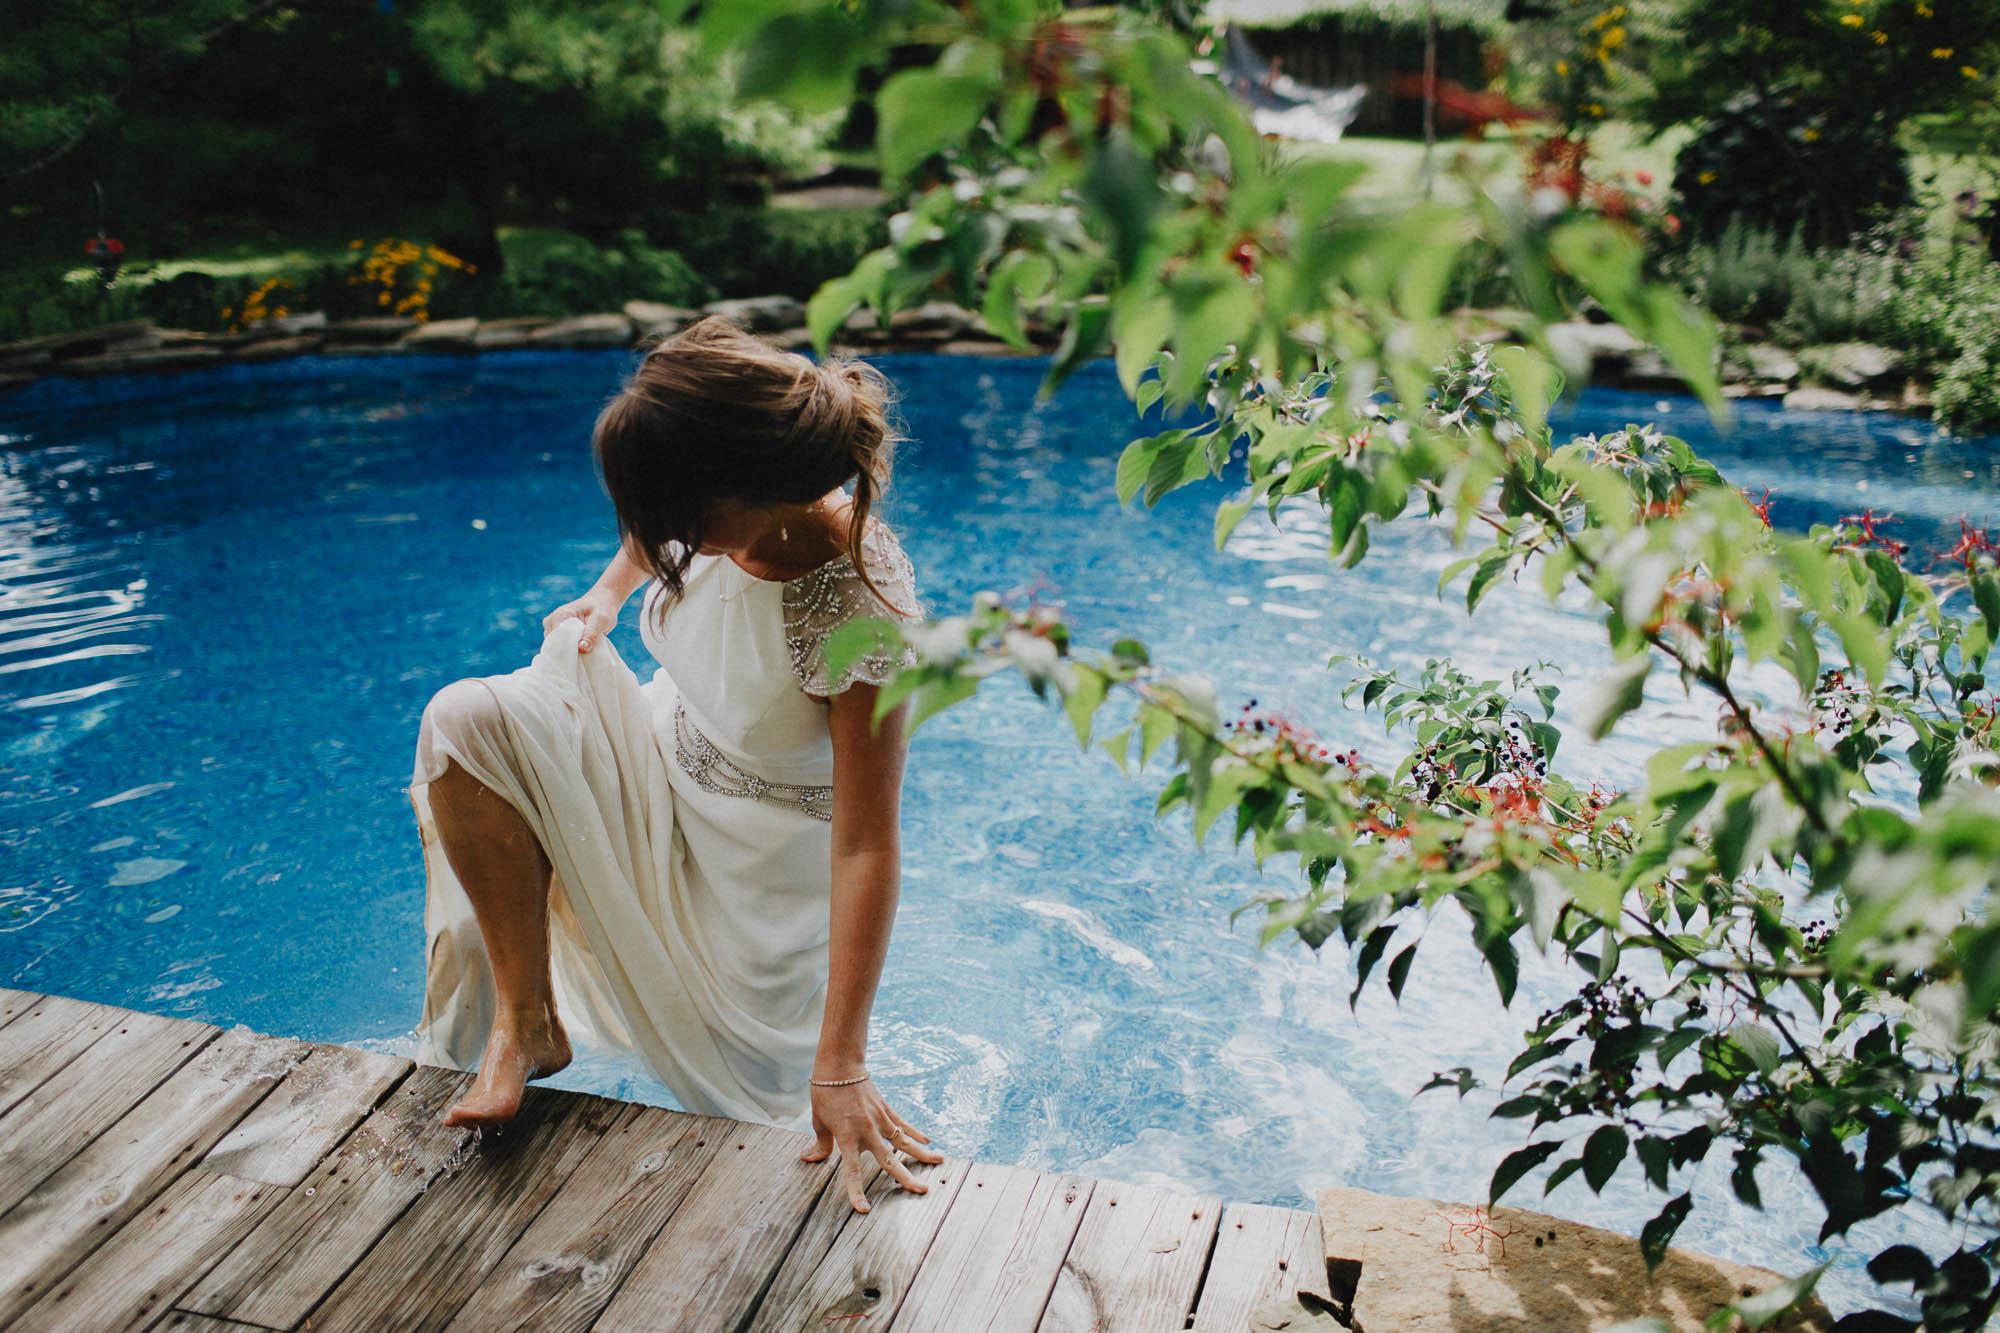 Leah-Graham-Michigan-Outdoor-DIY-Wedding-094@2x.jpg